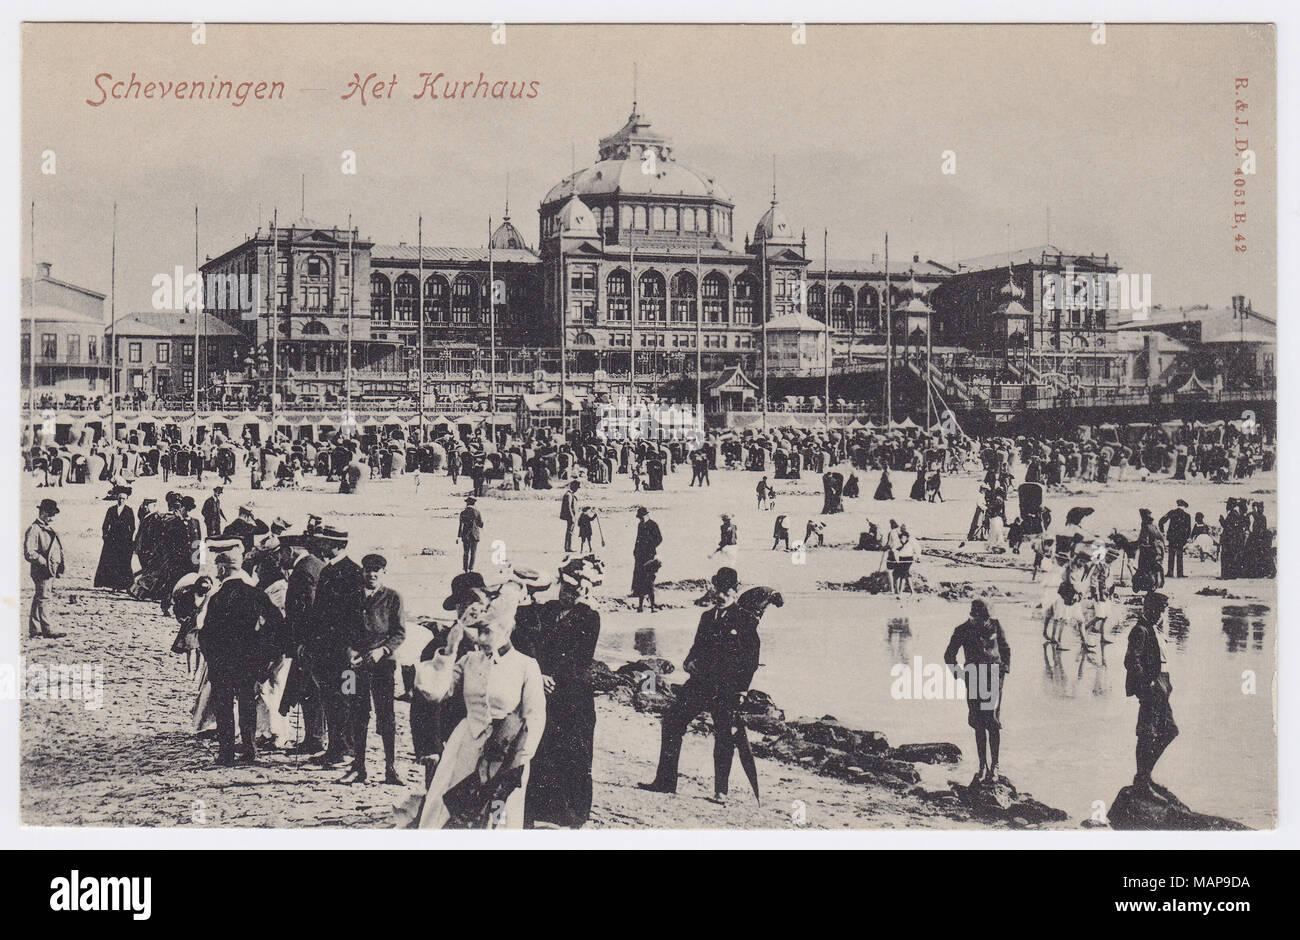 Kurhaus, Scheveningen, Netherlands - Stock Image